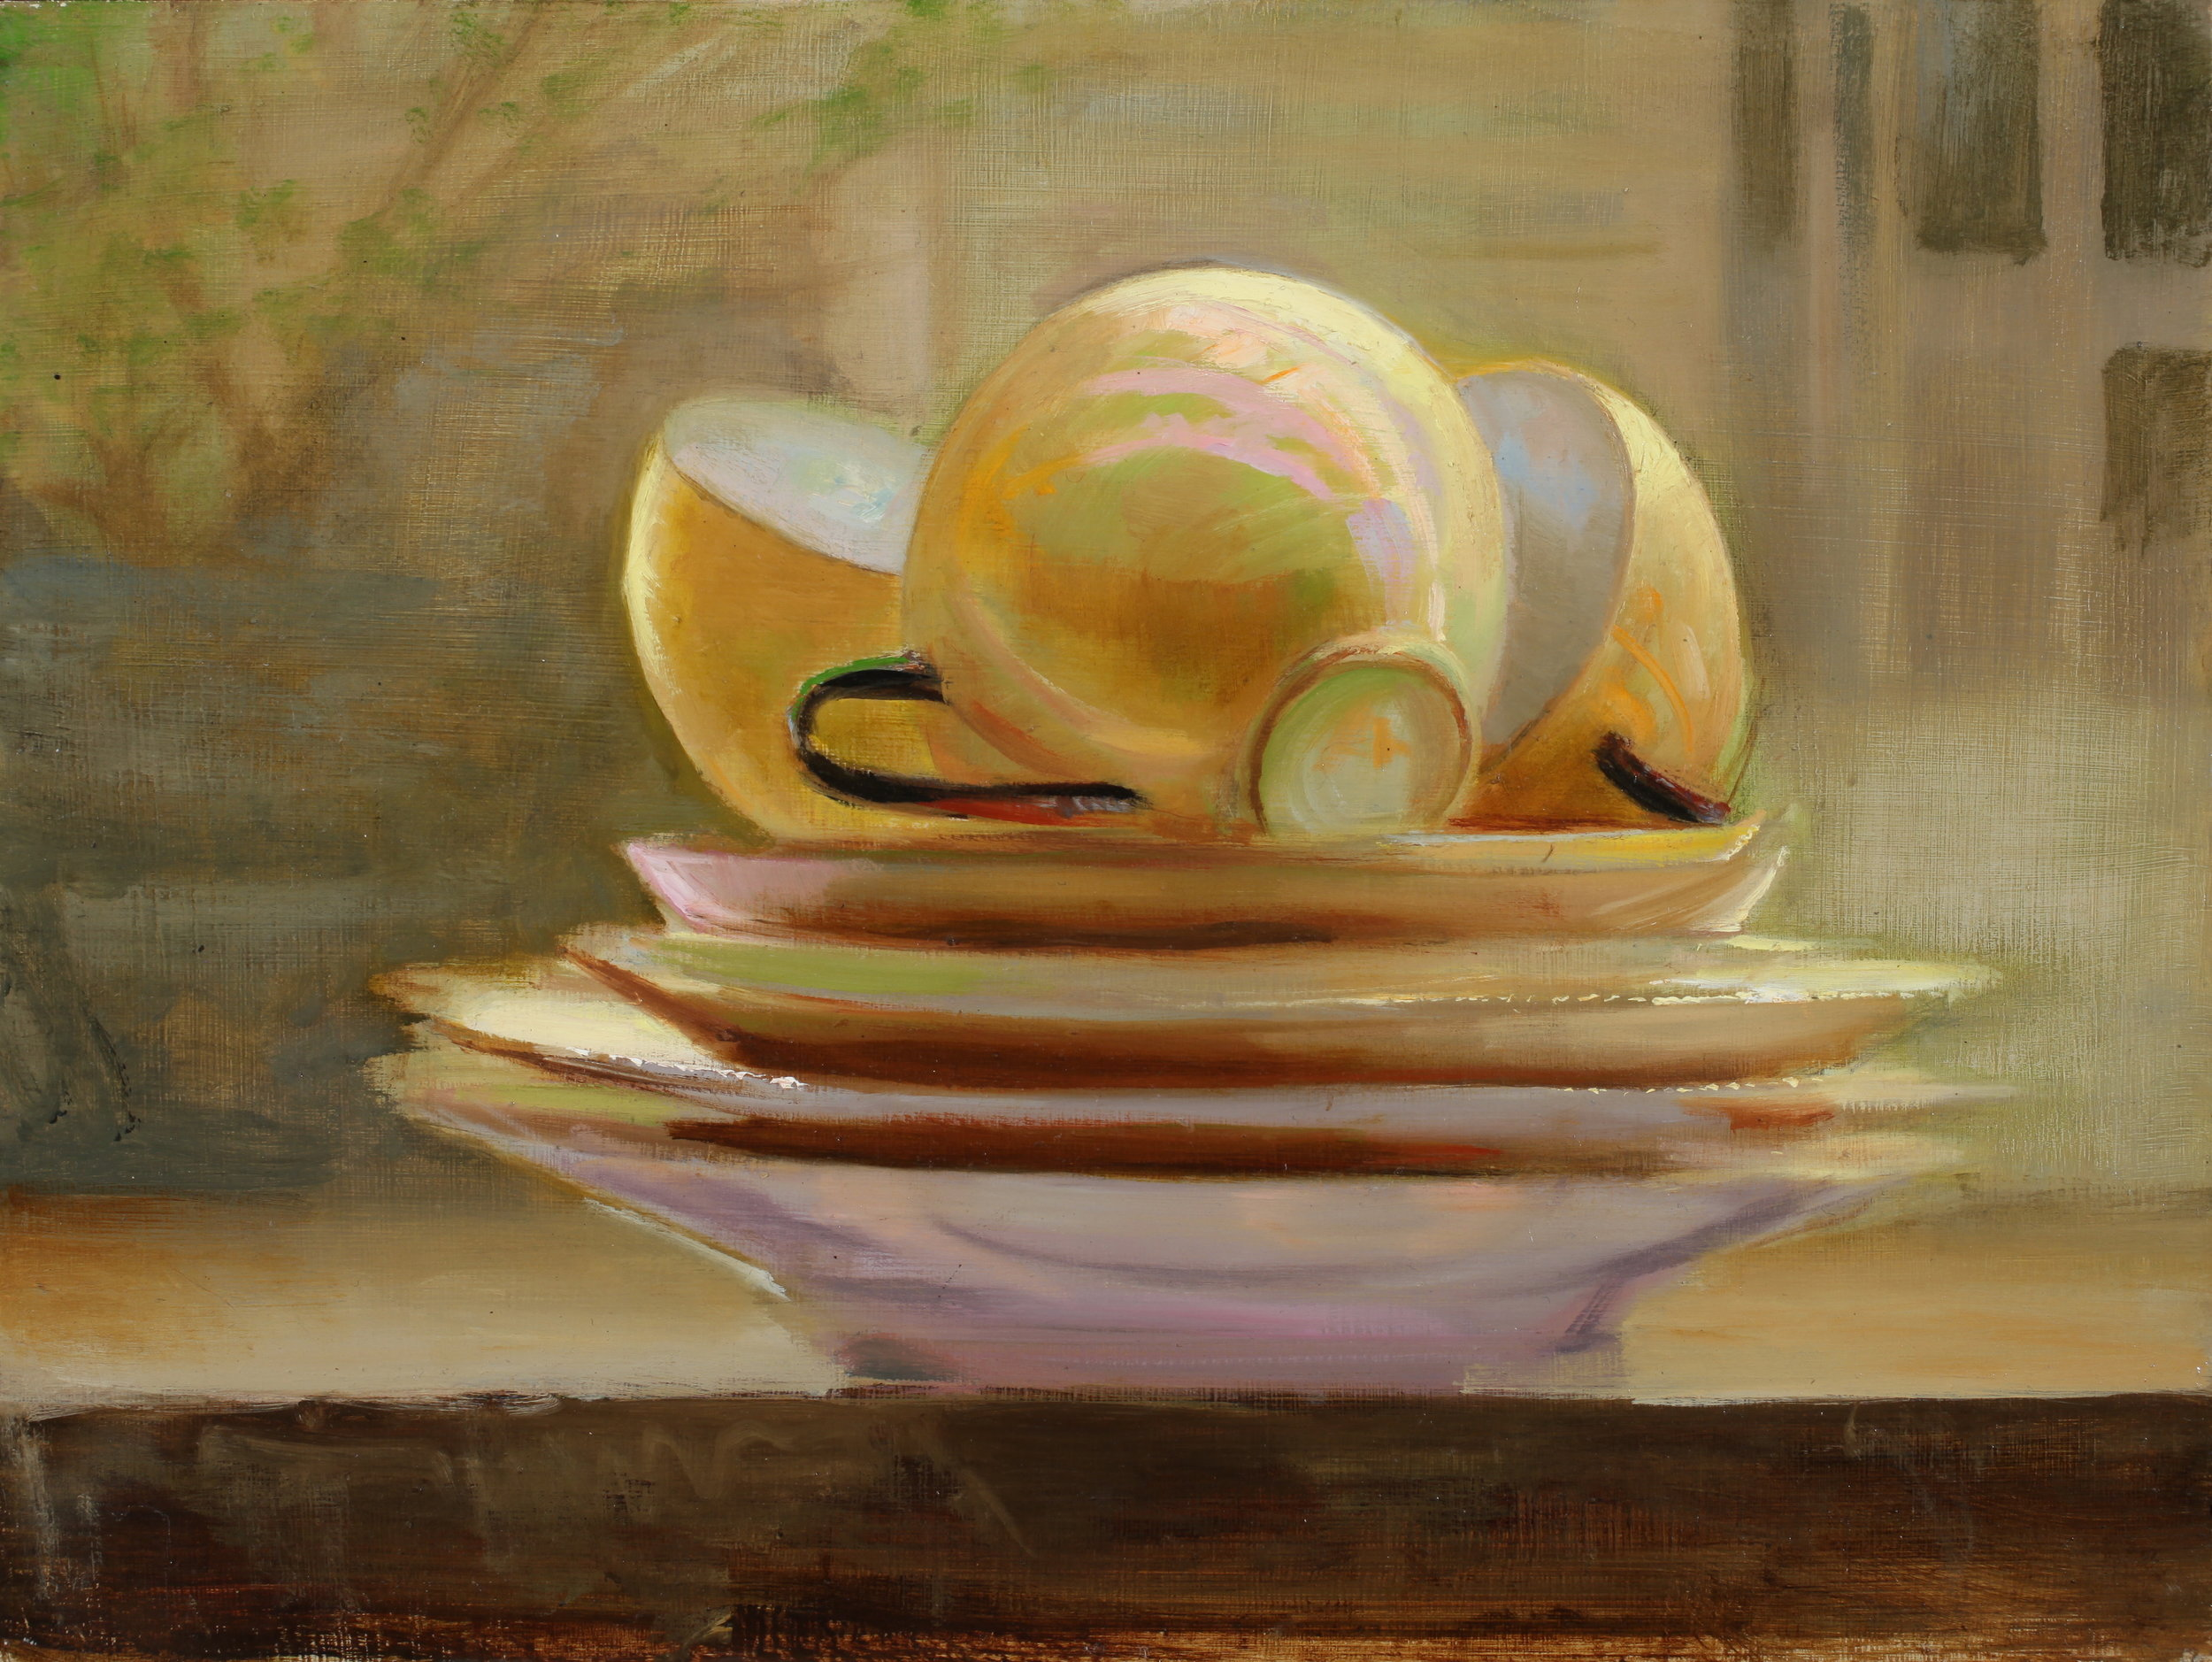 Teacups by Juliette Aristides 2019 oil on panel